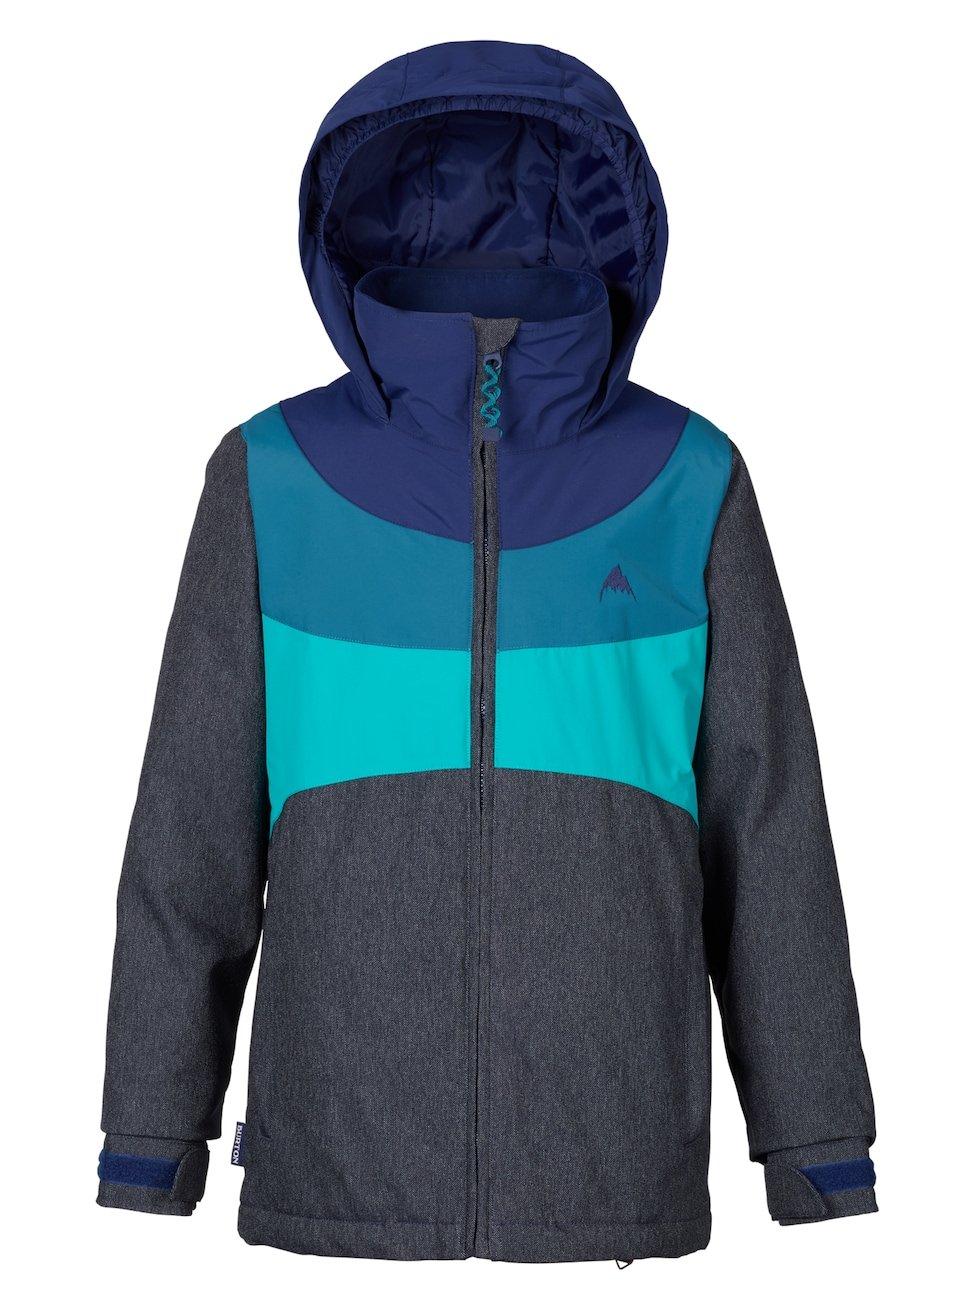 Burton Girls Youth Hart Snow Jacket Denim/Spellbound/Jaded Size Large by Burton